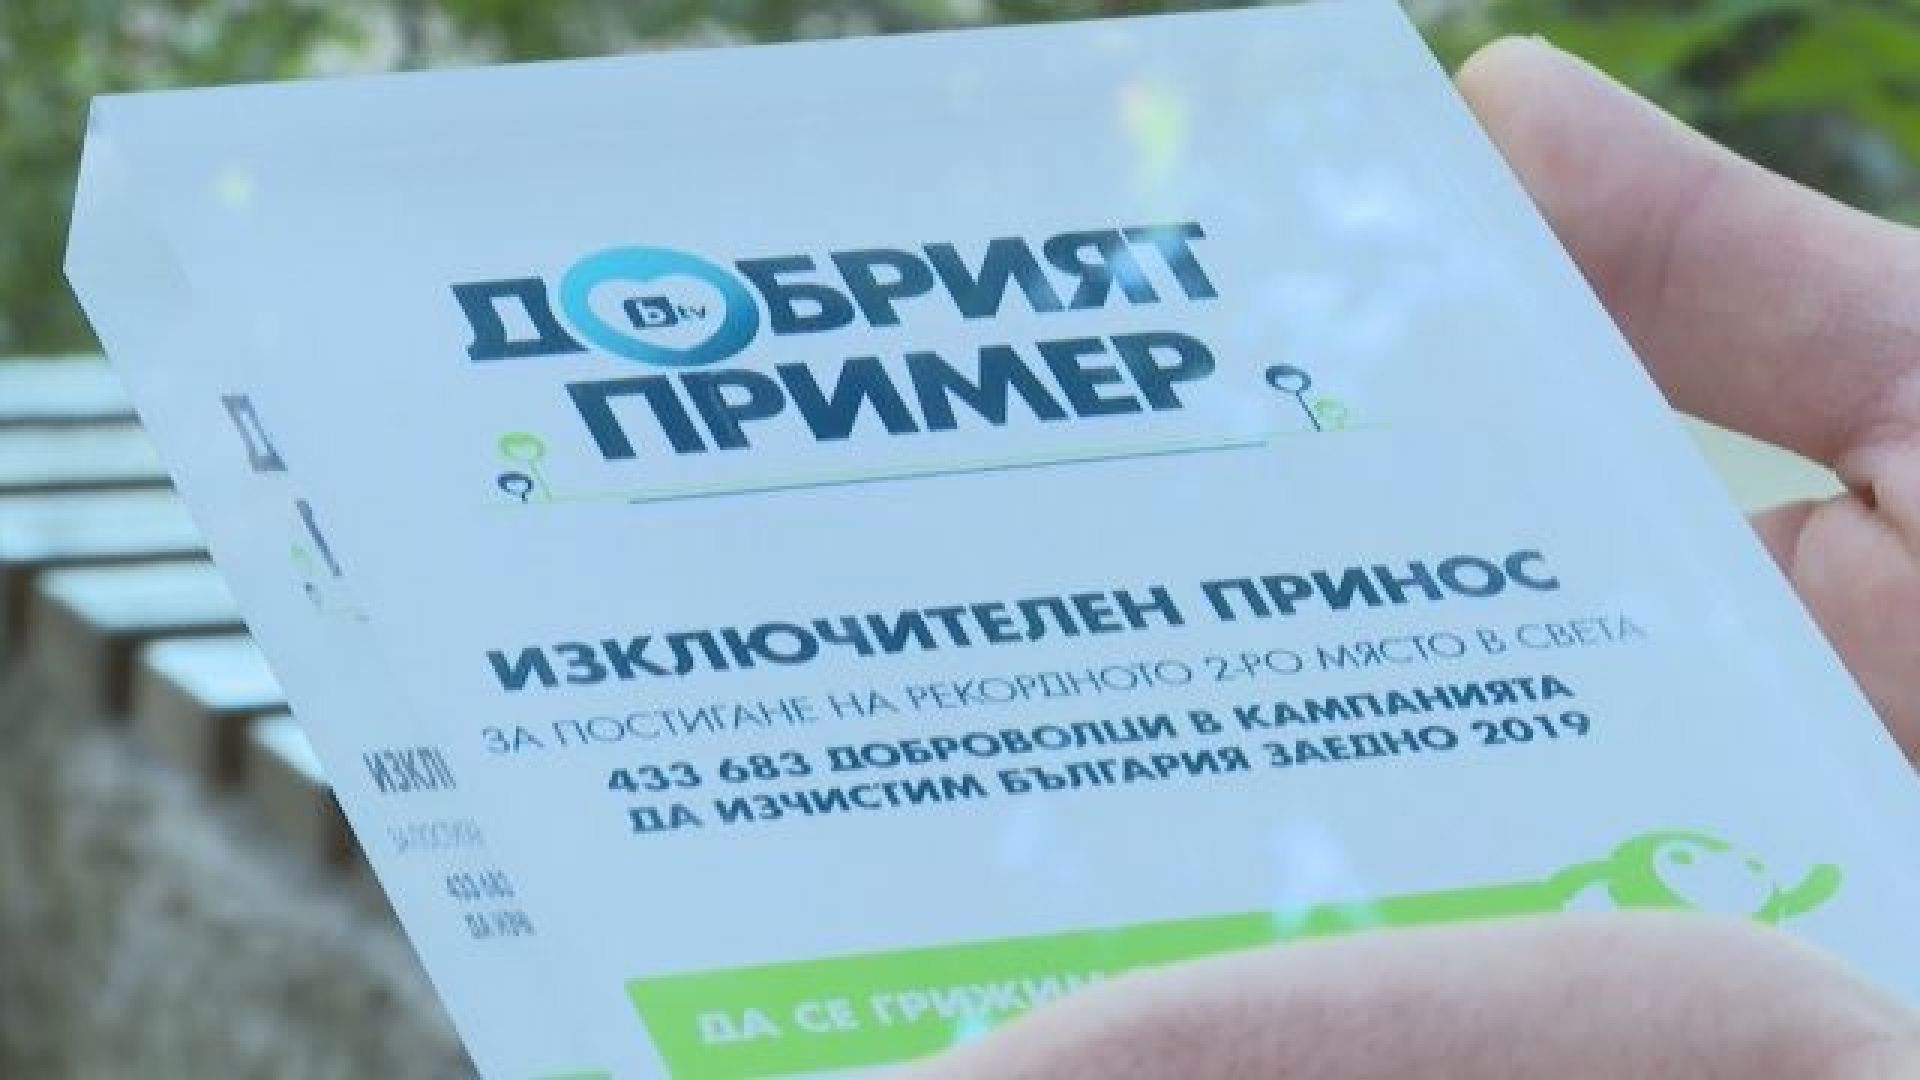 """Да изчистим България заедно"" отличи партньори и доброволци - рекордьори в зелената инициатива"